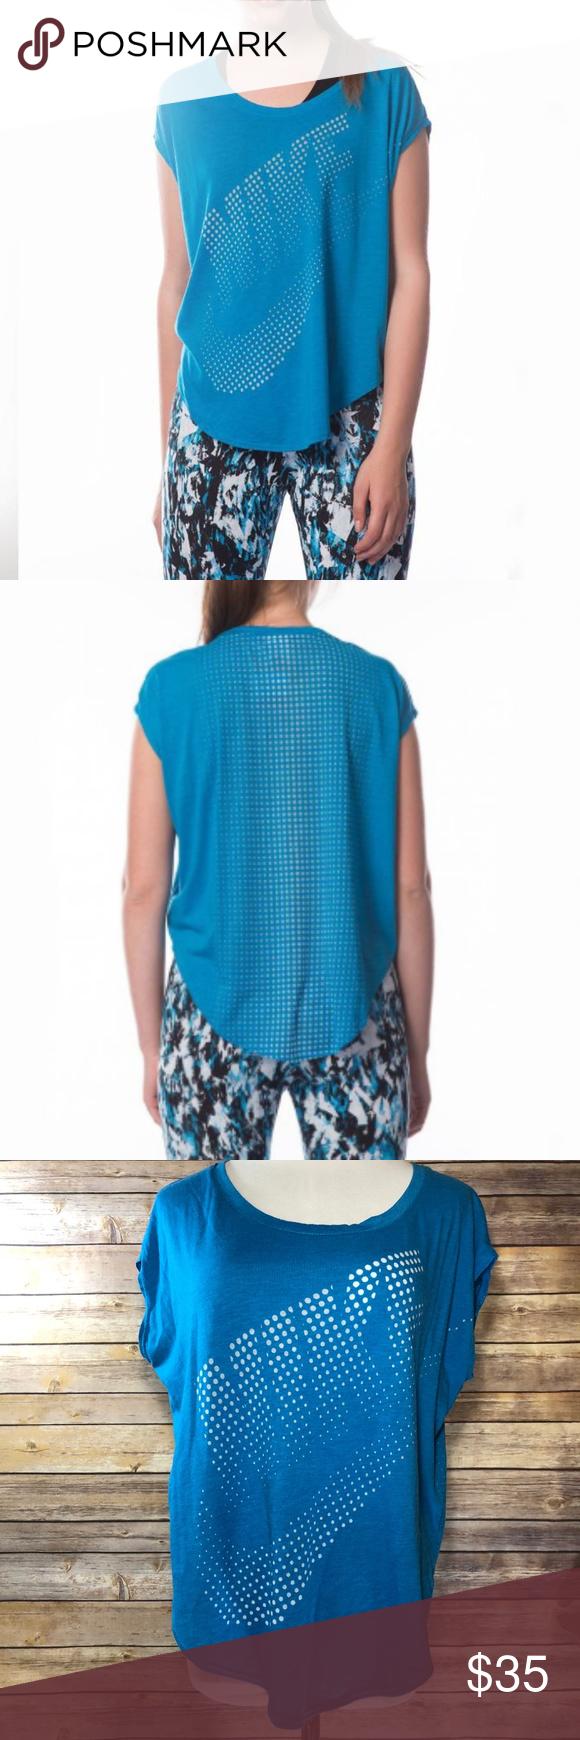 Nike Blue Short Sleeve Burnout Tee Shirt Clothes design